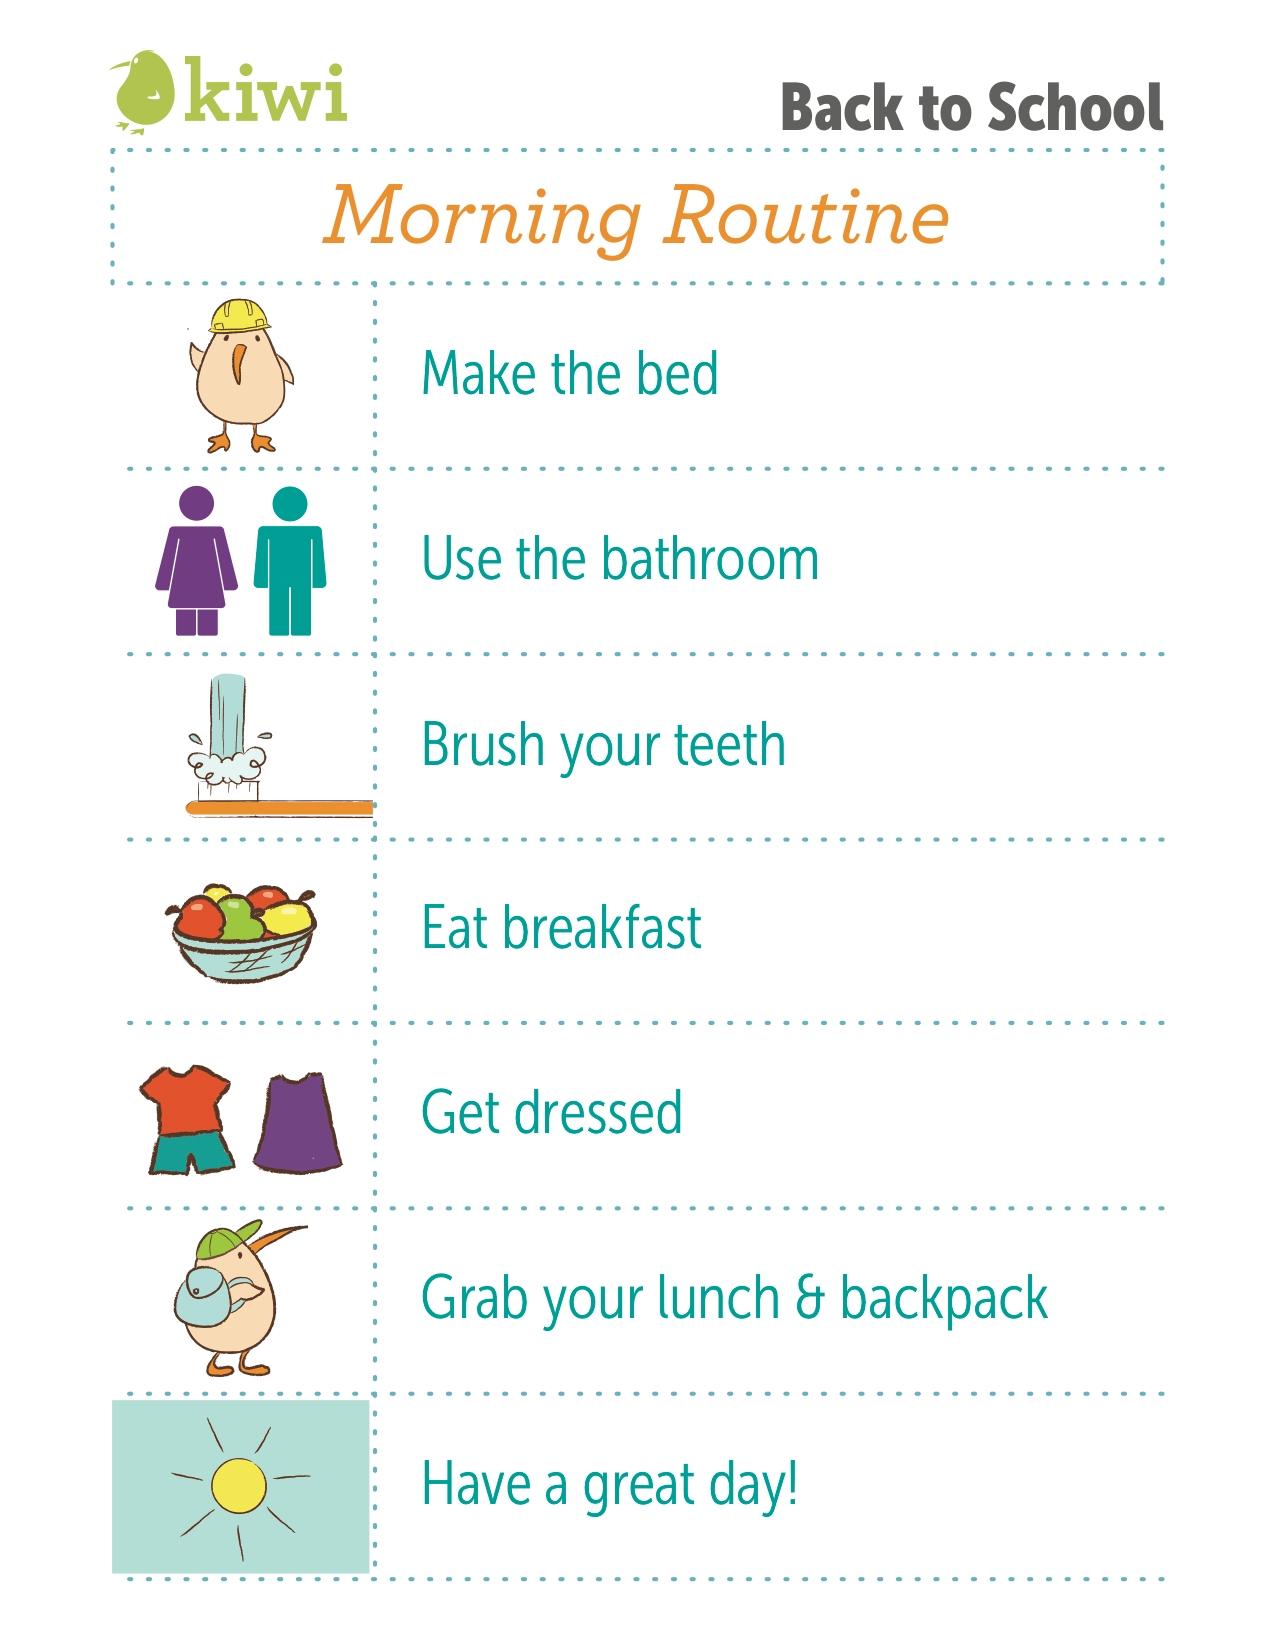 BTS_KiwiCrate_morning_routine_(1).jpg